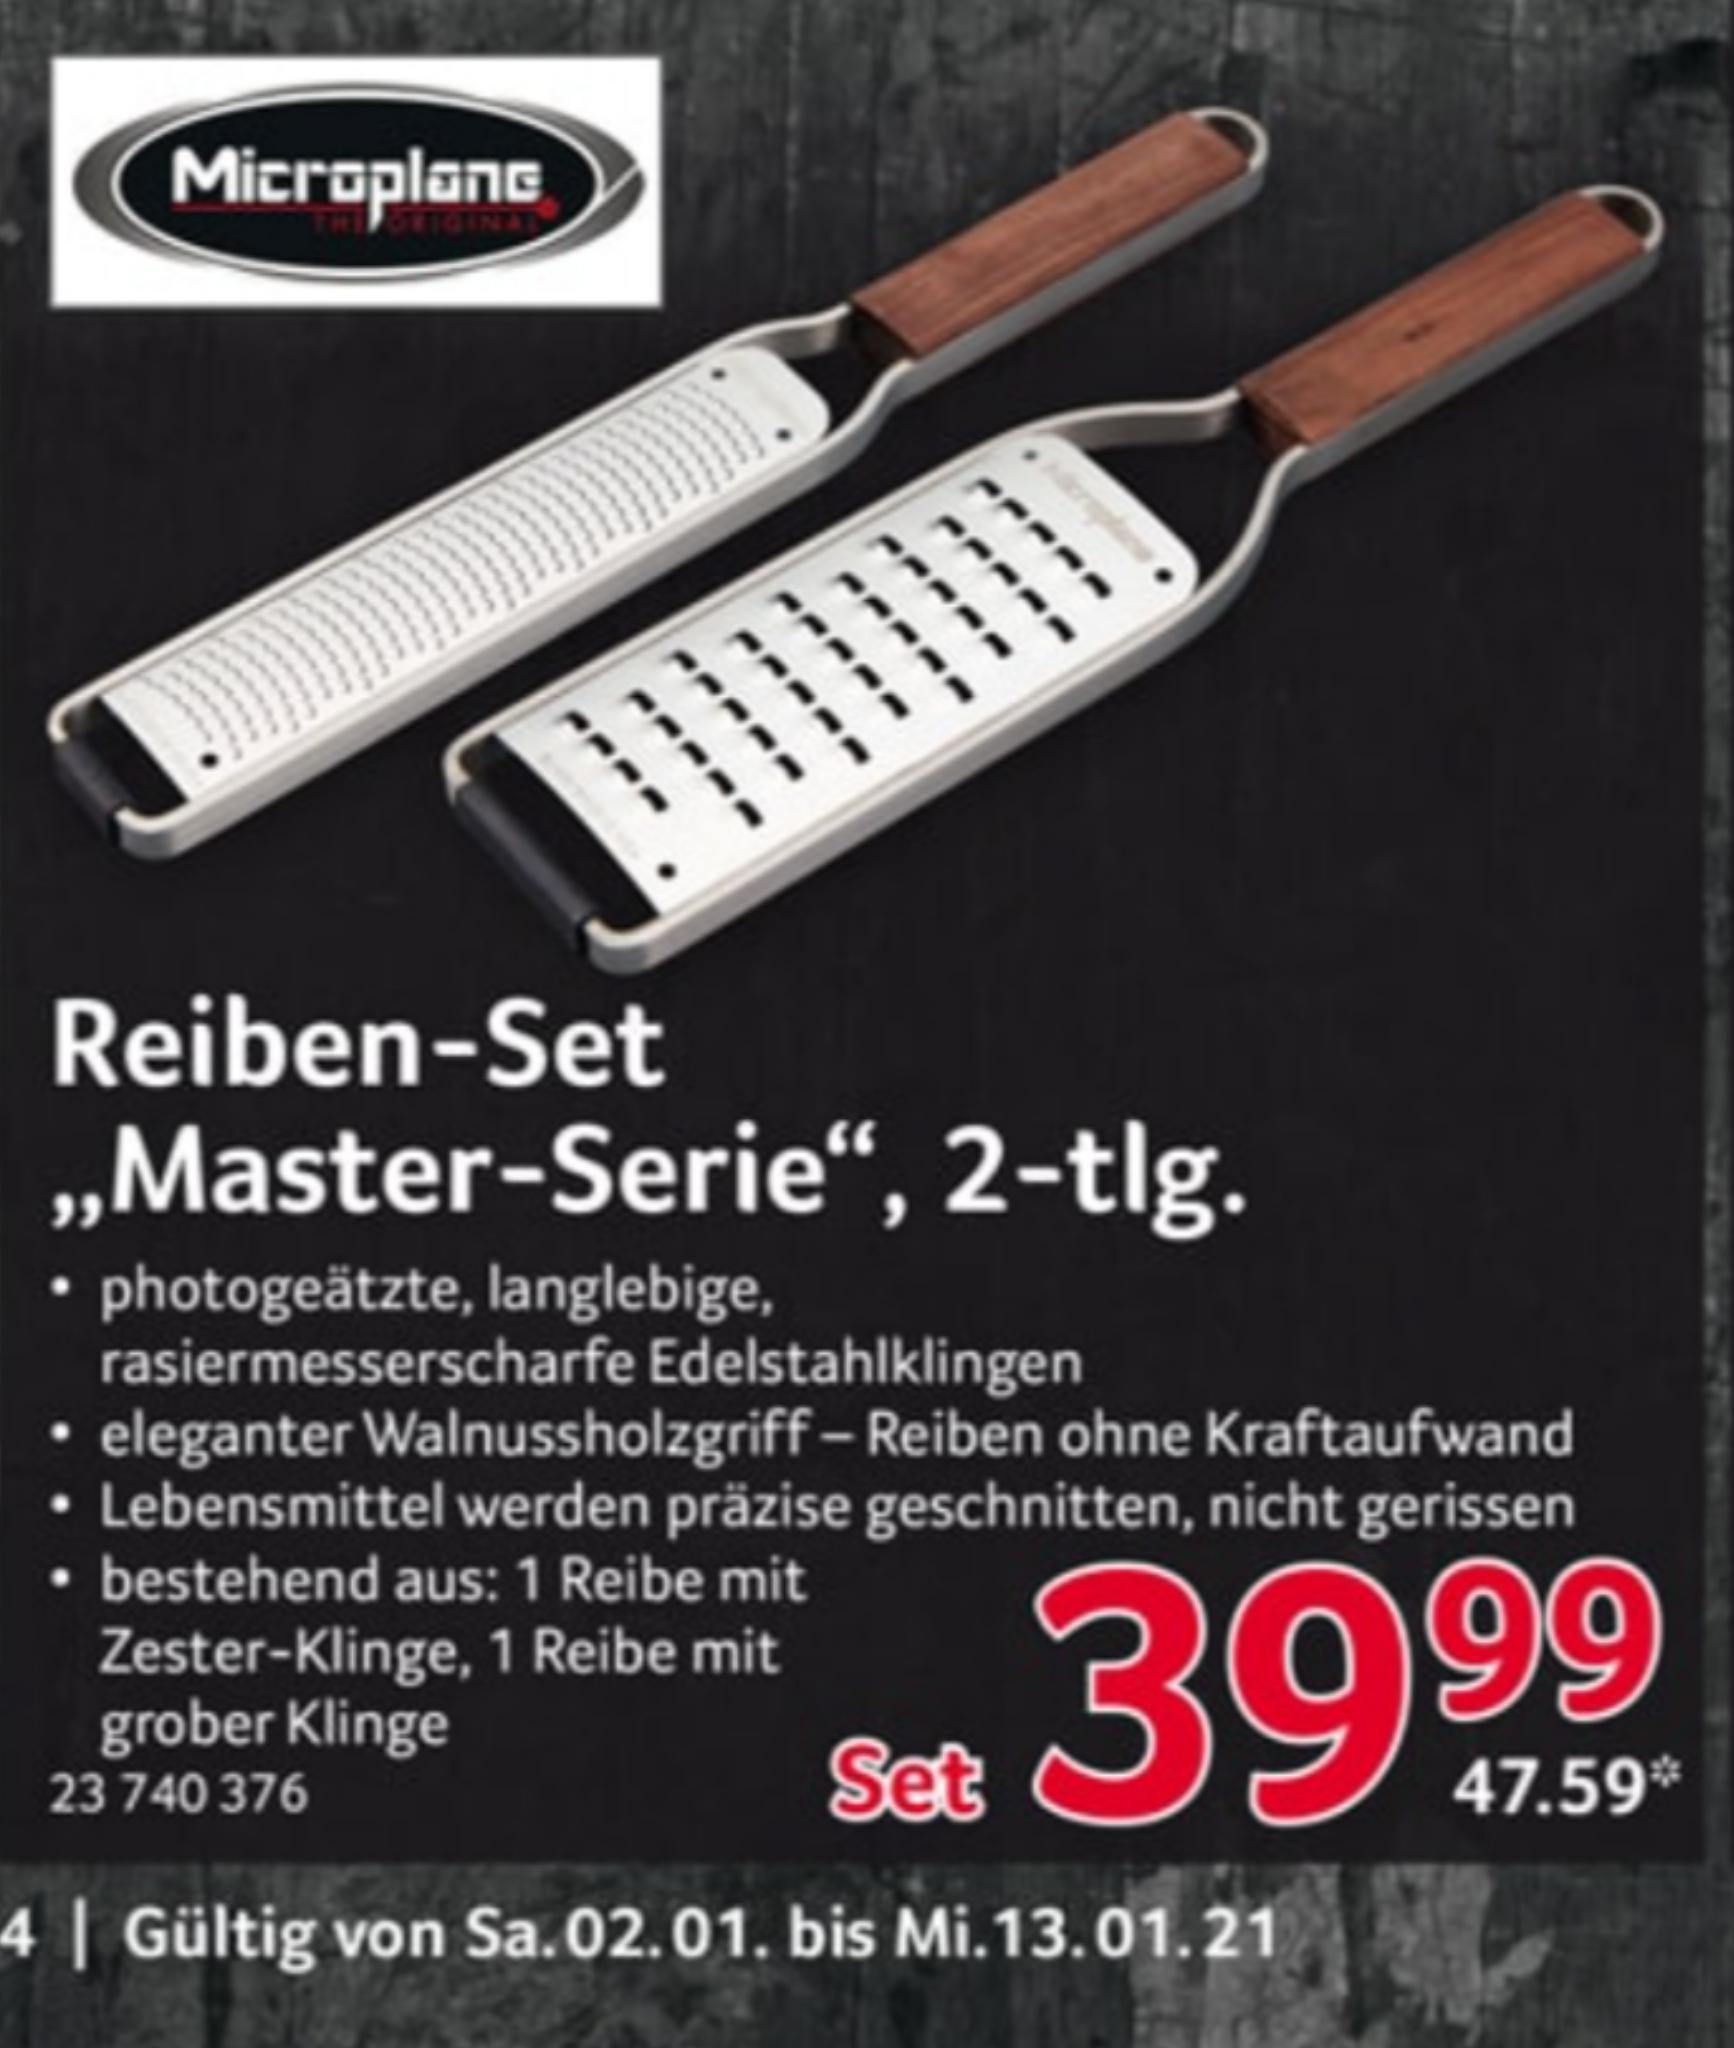 Selgros: Microplane Master-Serie 2-tlg